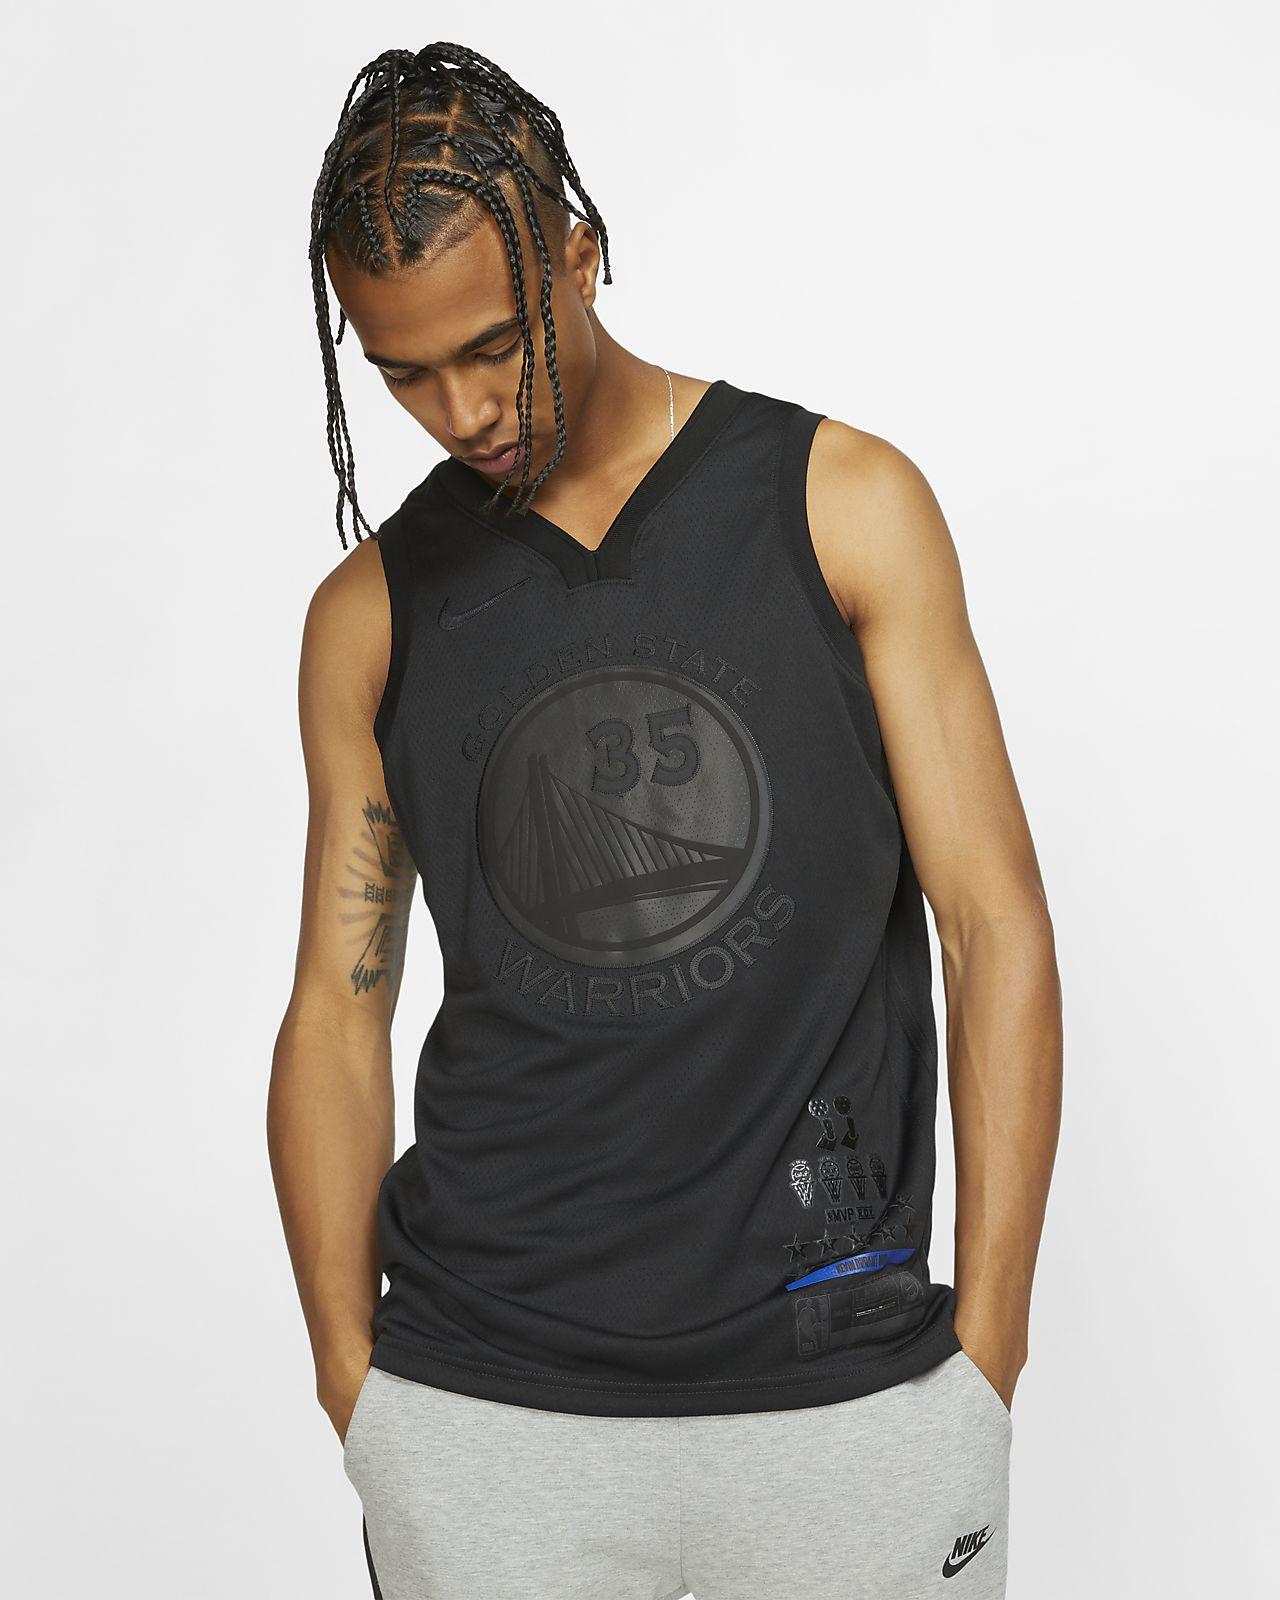 ed7ba73bb5f ... Kevin Durant MVP Swingman (Golden State Warriors) Camiseta Nike NBA  Connected - Hombre